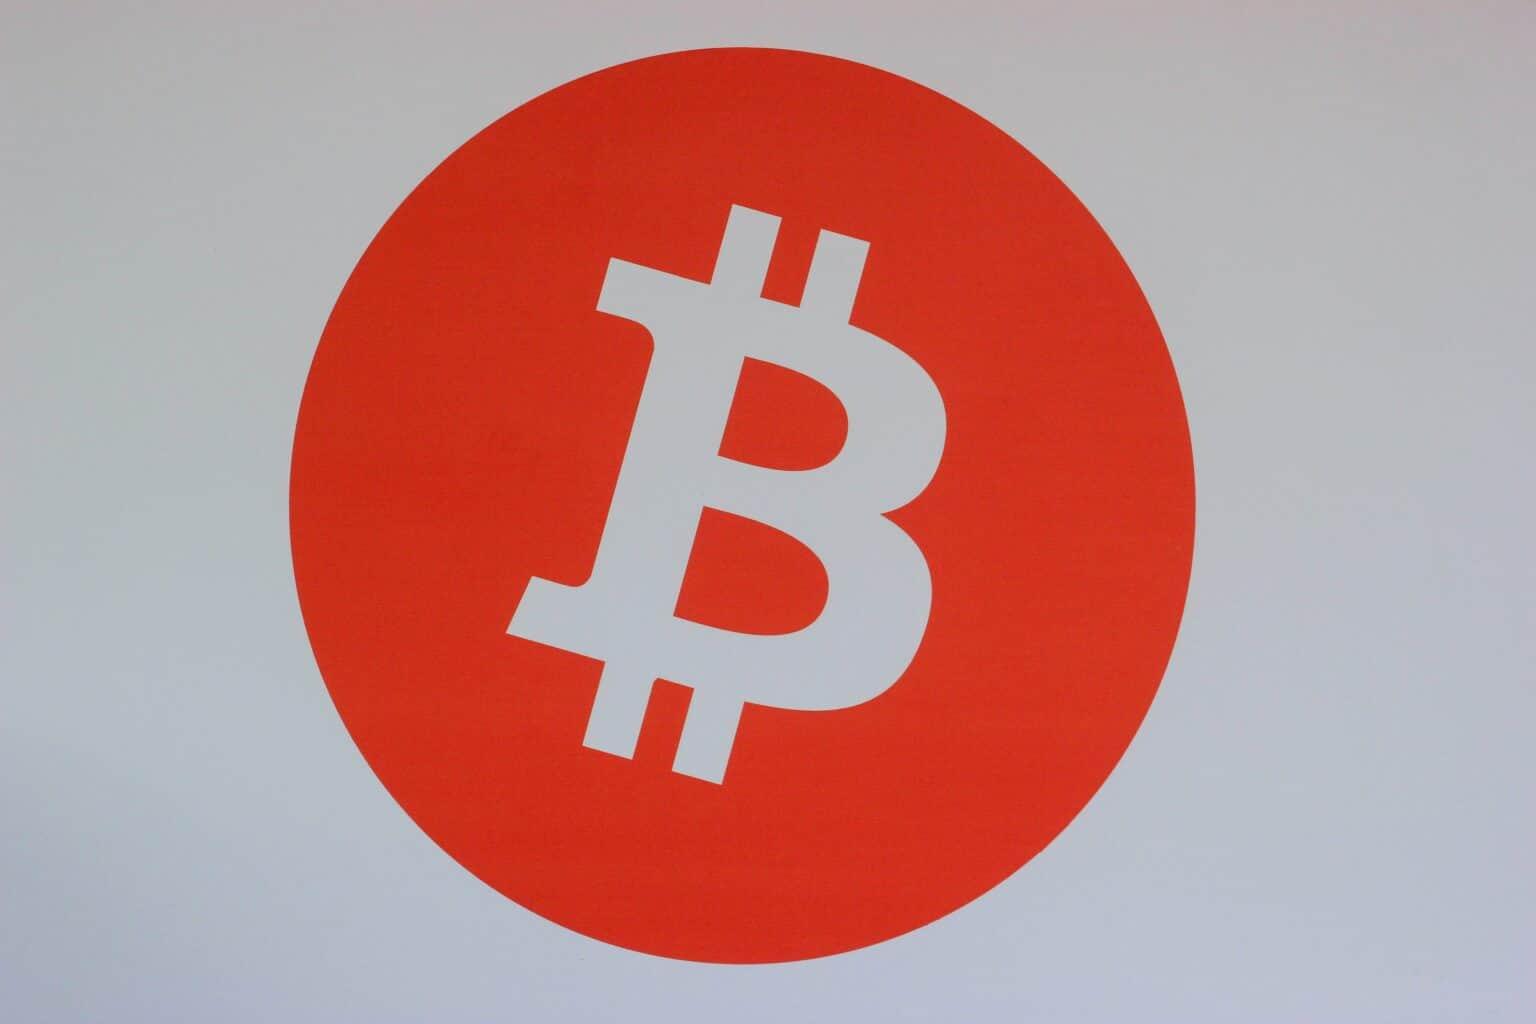 bitcoin stock price now